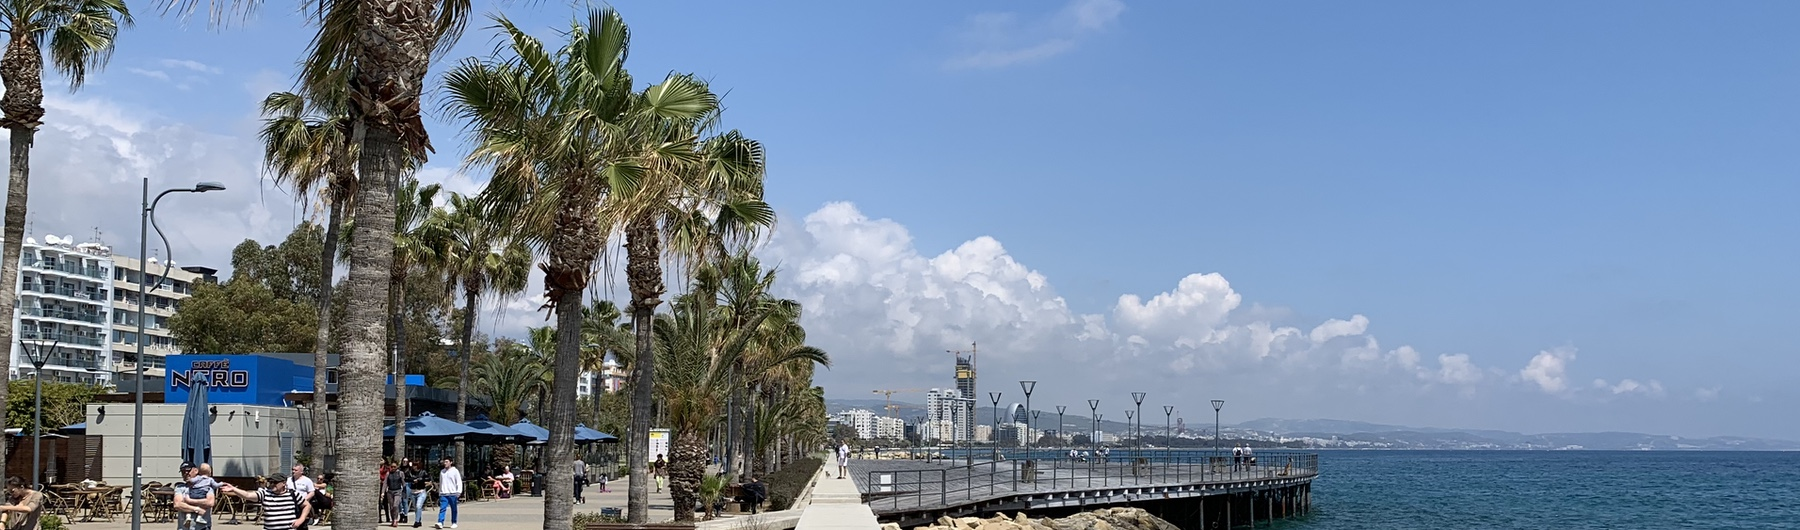 CyprusJS Limassol